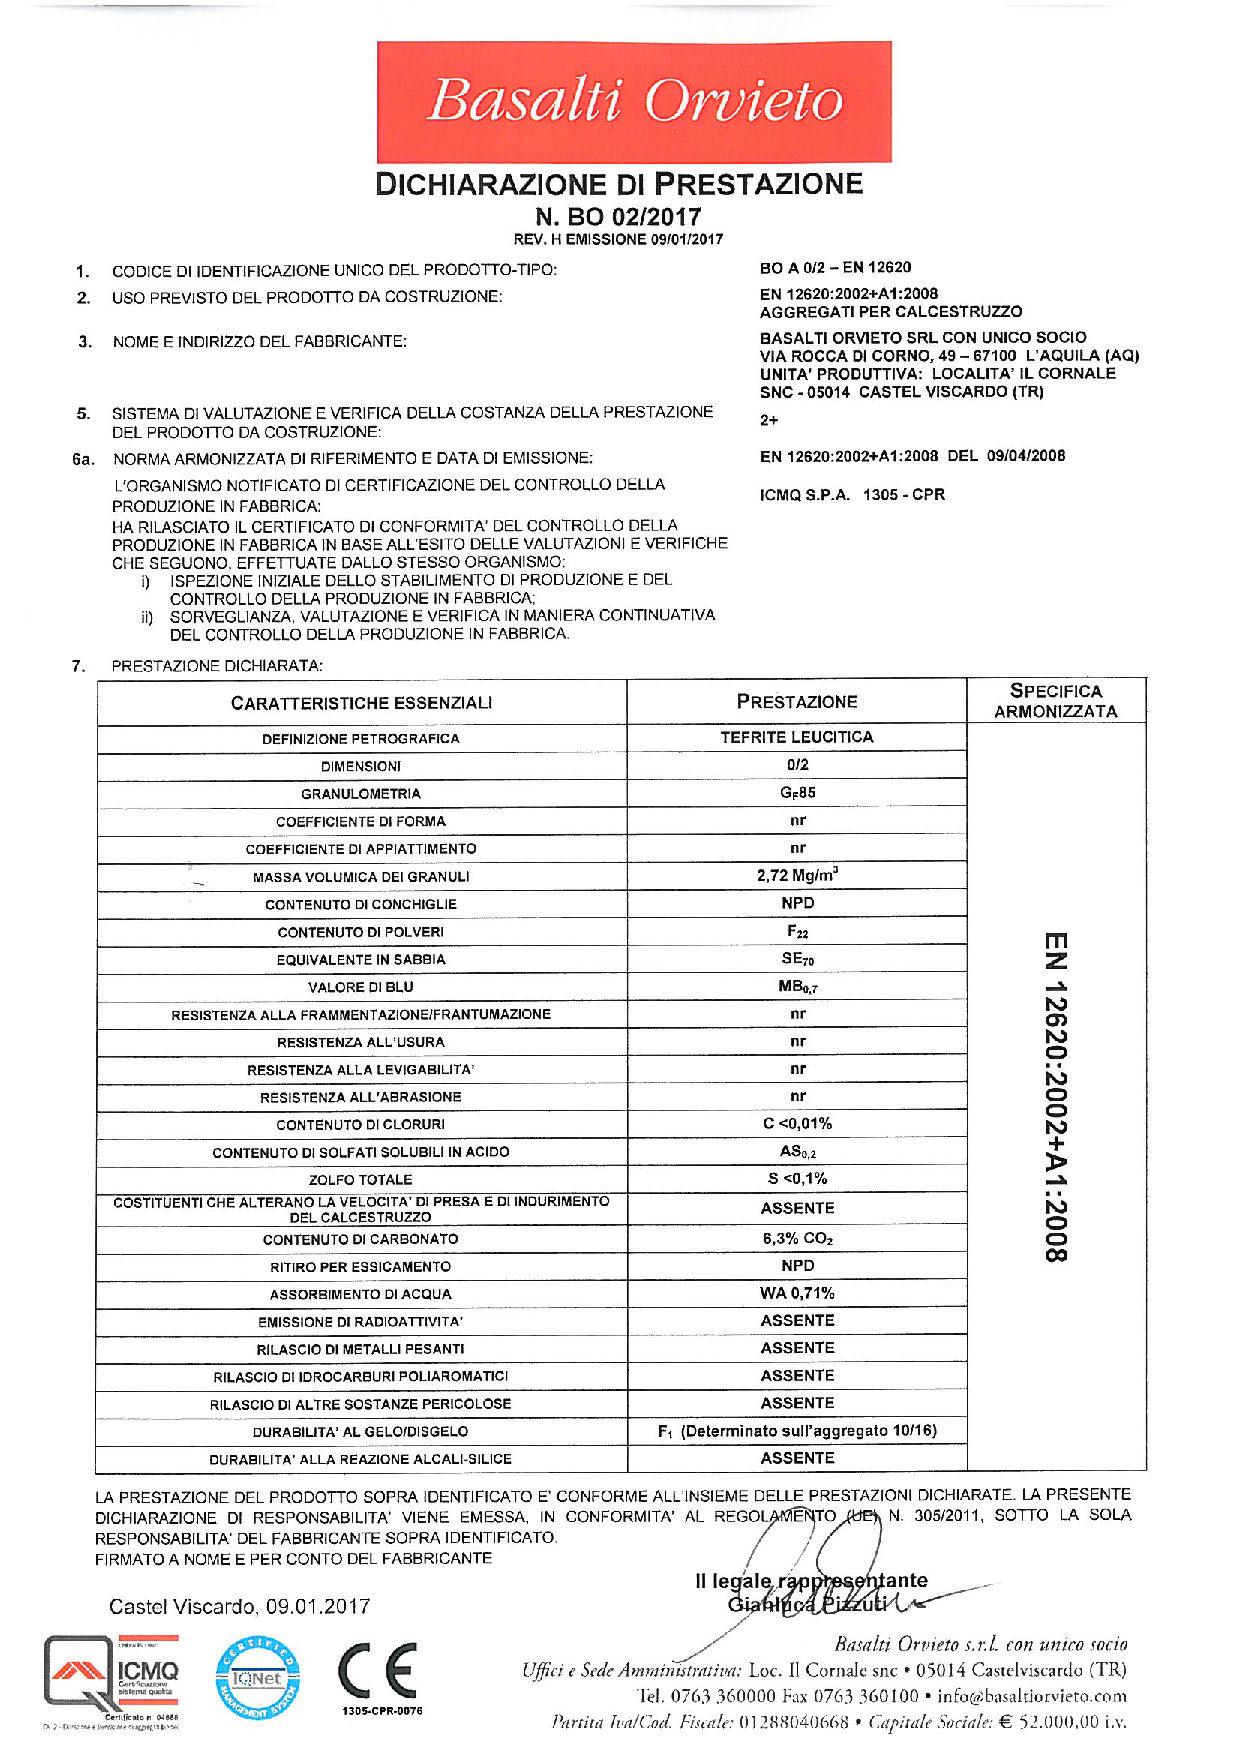 Calcestruzzo_DoP 0-2 - EN 12620